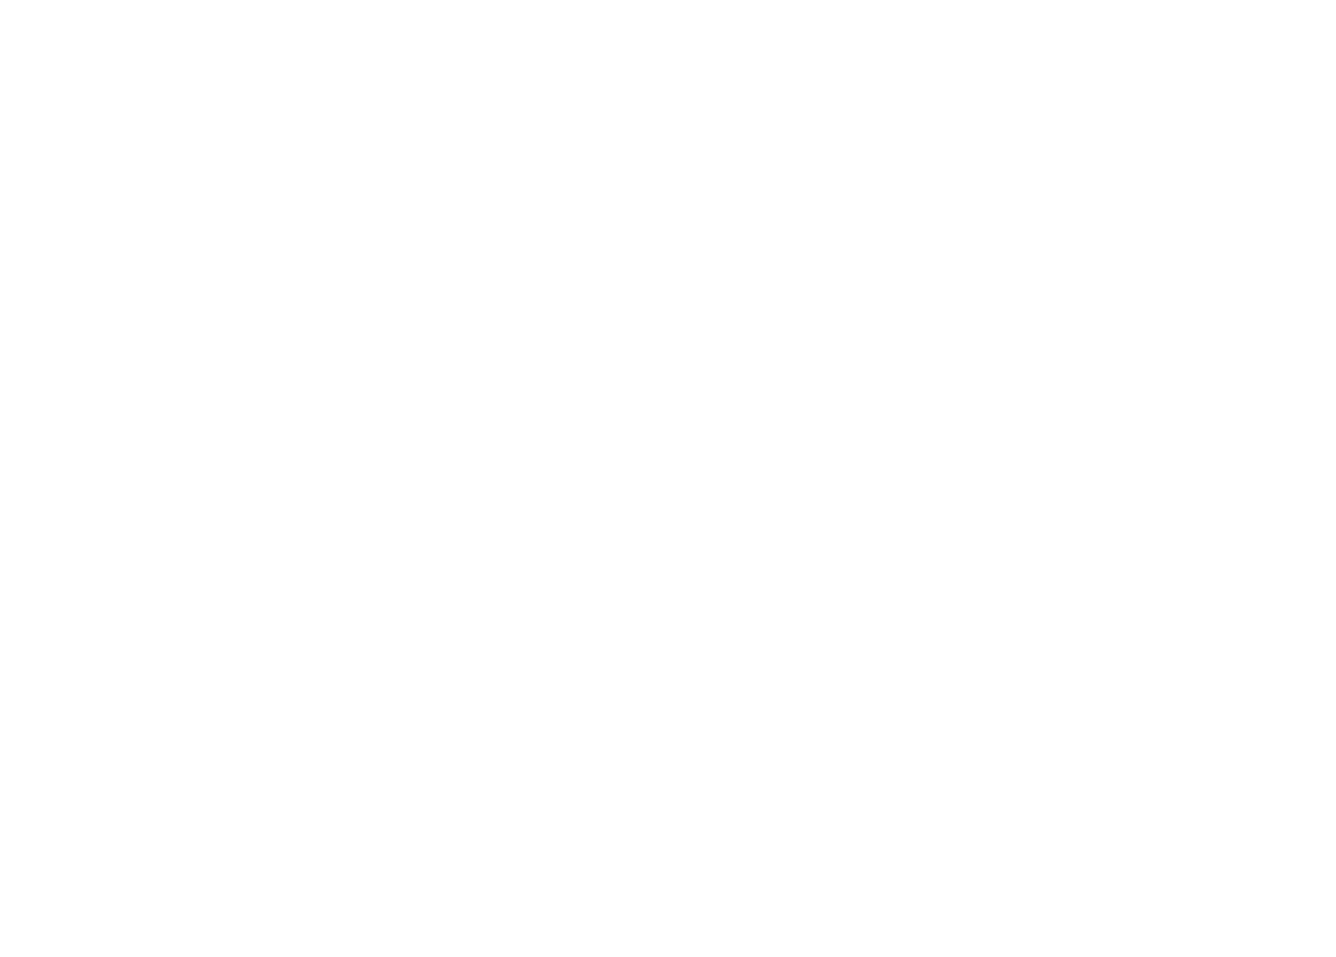 Semaine green logo